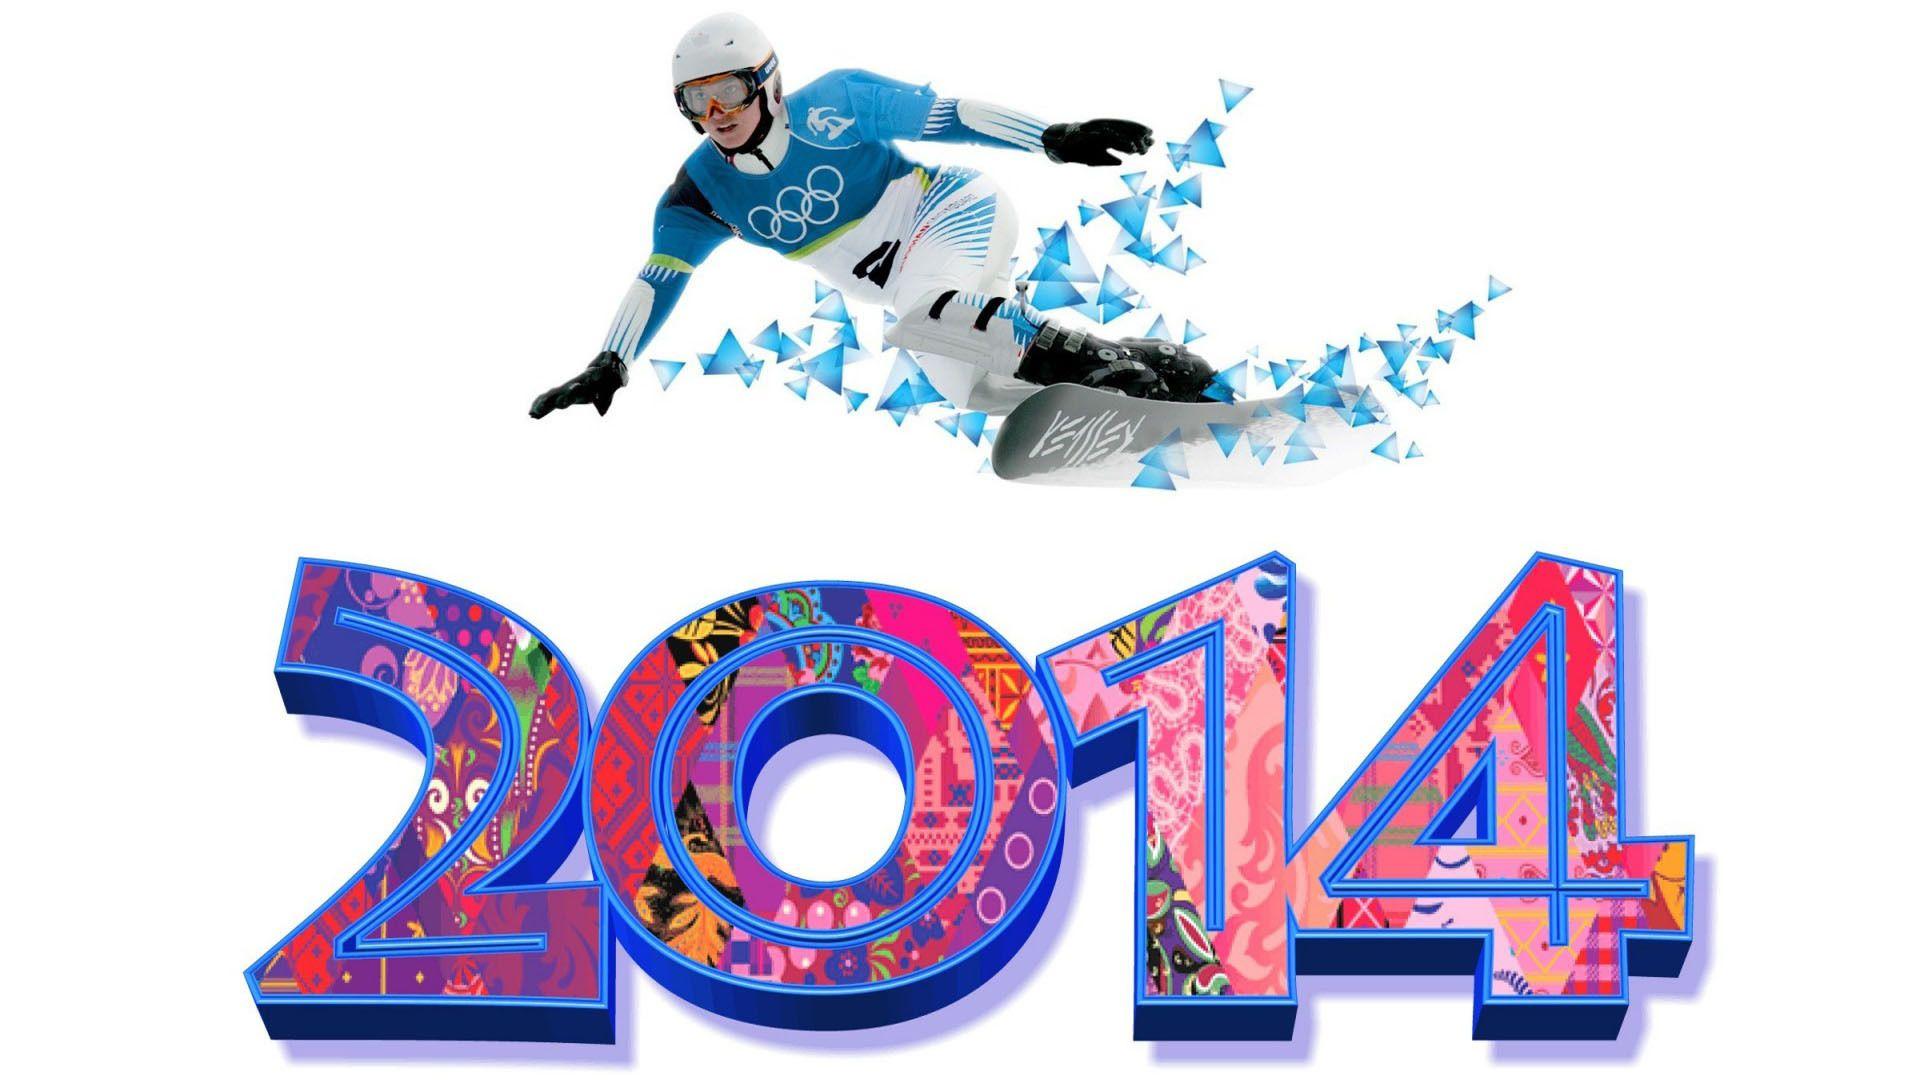 Sochi Winter Olympics 2014 Snowboarding Wallpaper Jpg 1920 1080 Winter Olympics Sochi Snowboarding